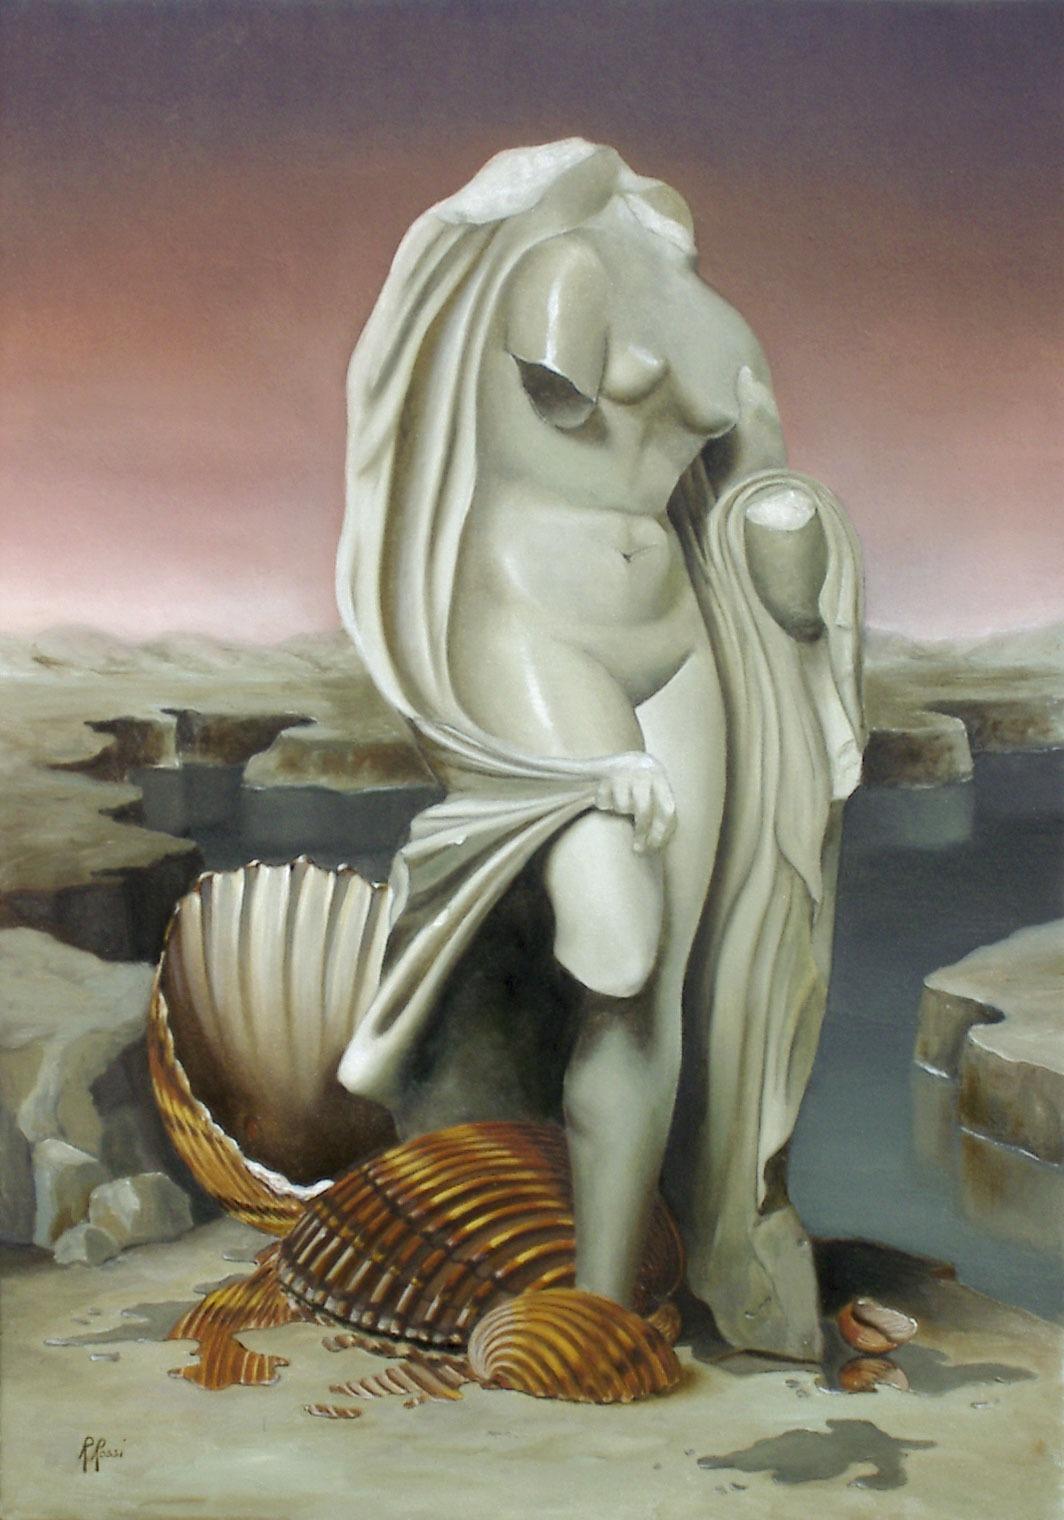 2007 roberta rossi - L'alba di Afrodite - olio su tela - 50 x 35